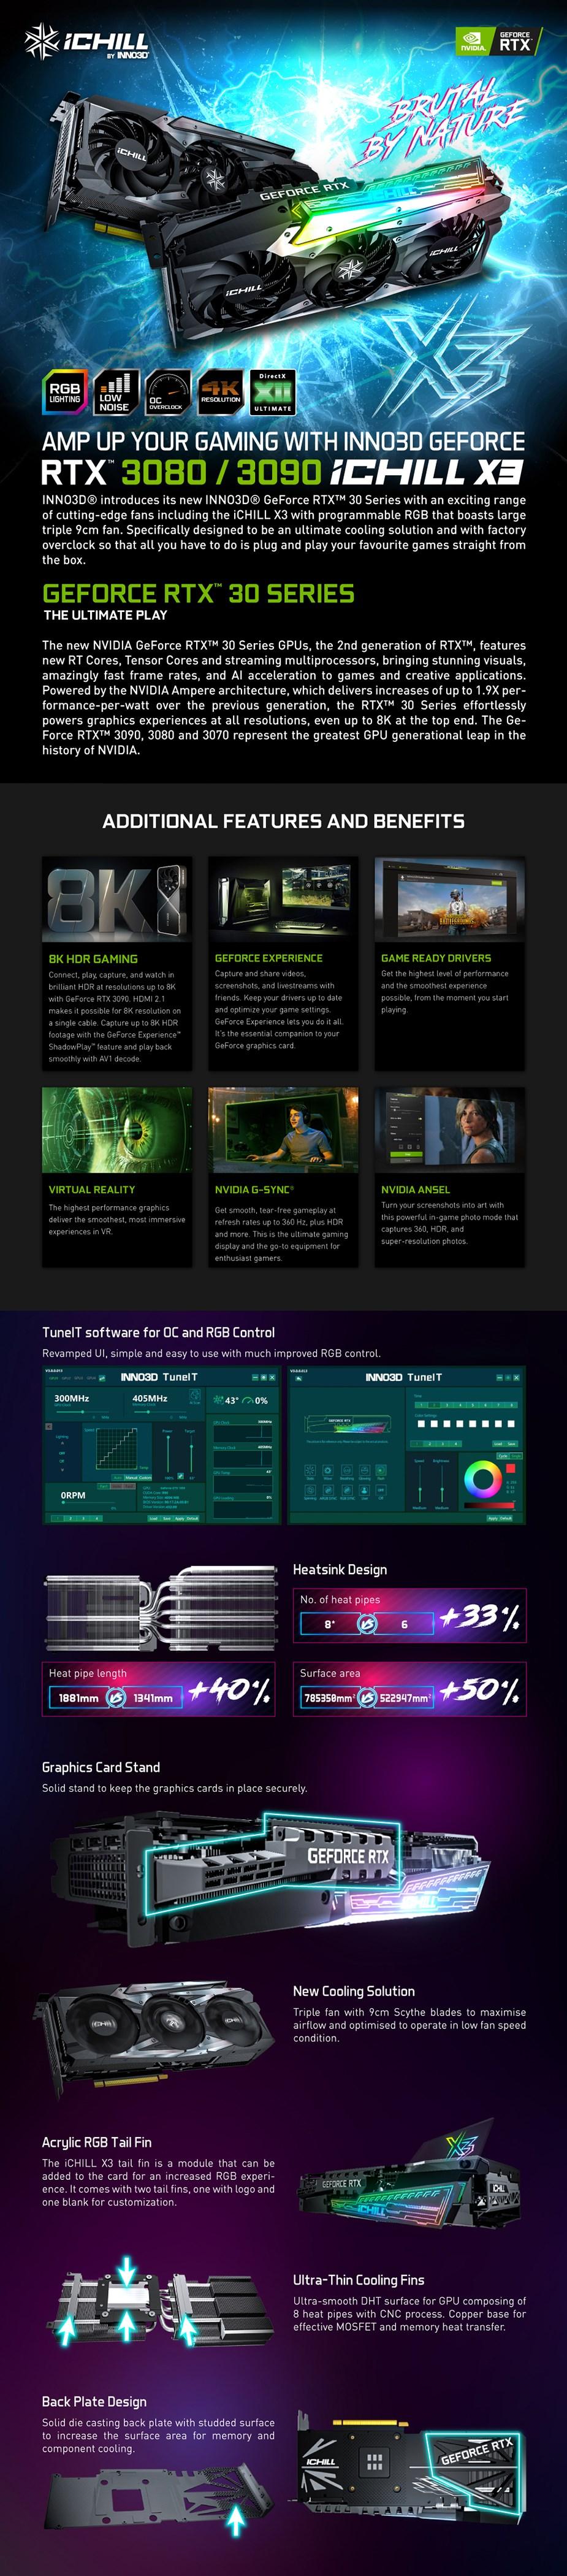 Inno3D GeForce RTX 3080 iChill X3 10GB Video Card - Overview 1